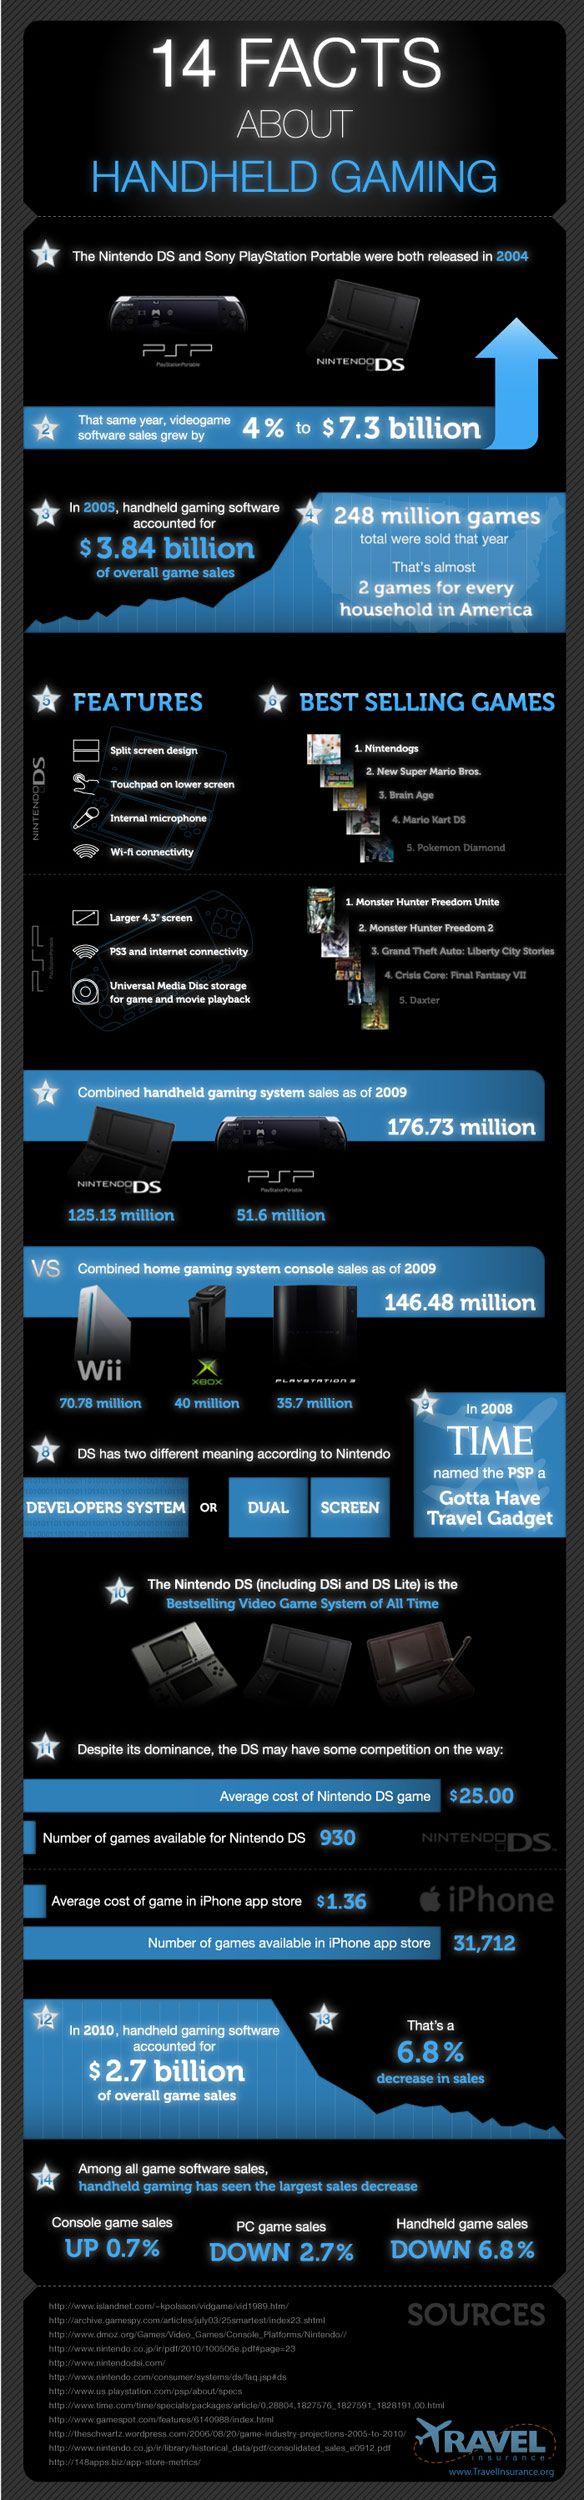 Handheld Gaming Best Minecraft Servers Gameboy Gaming Facts